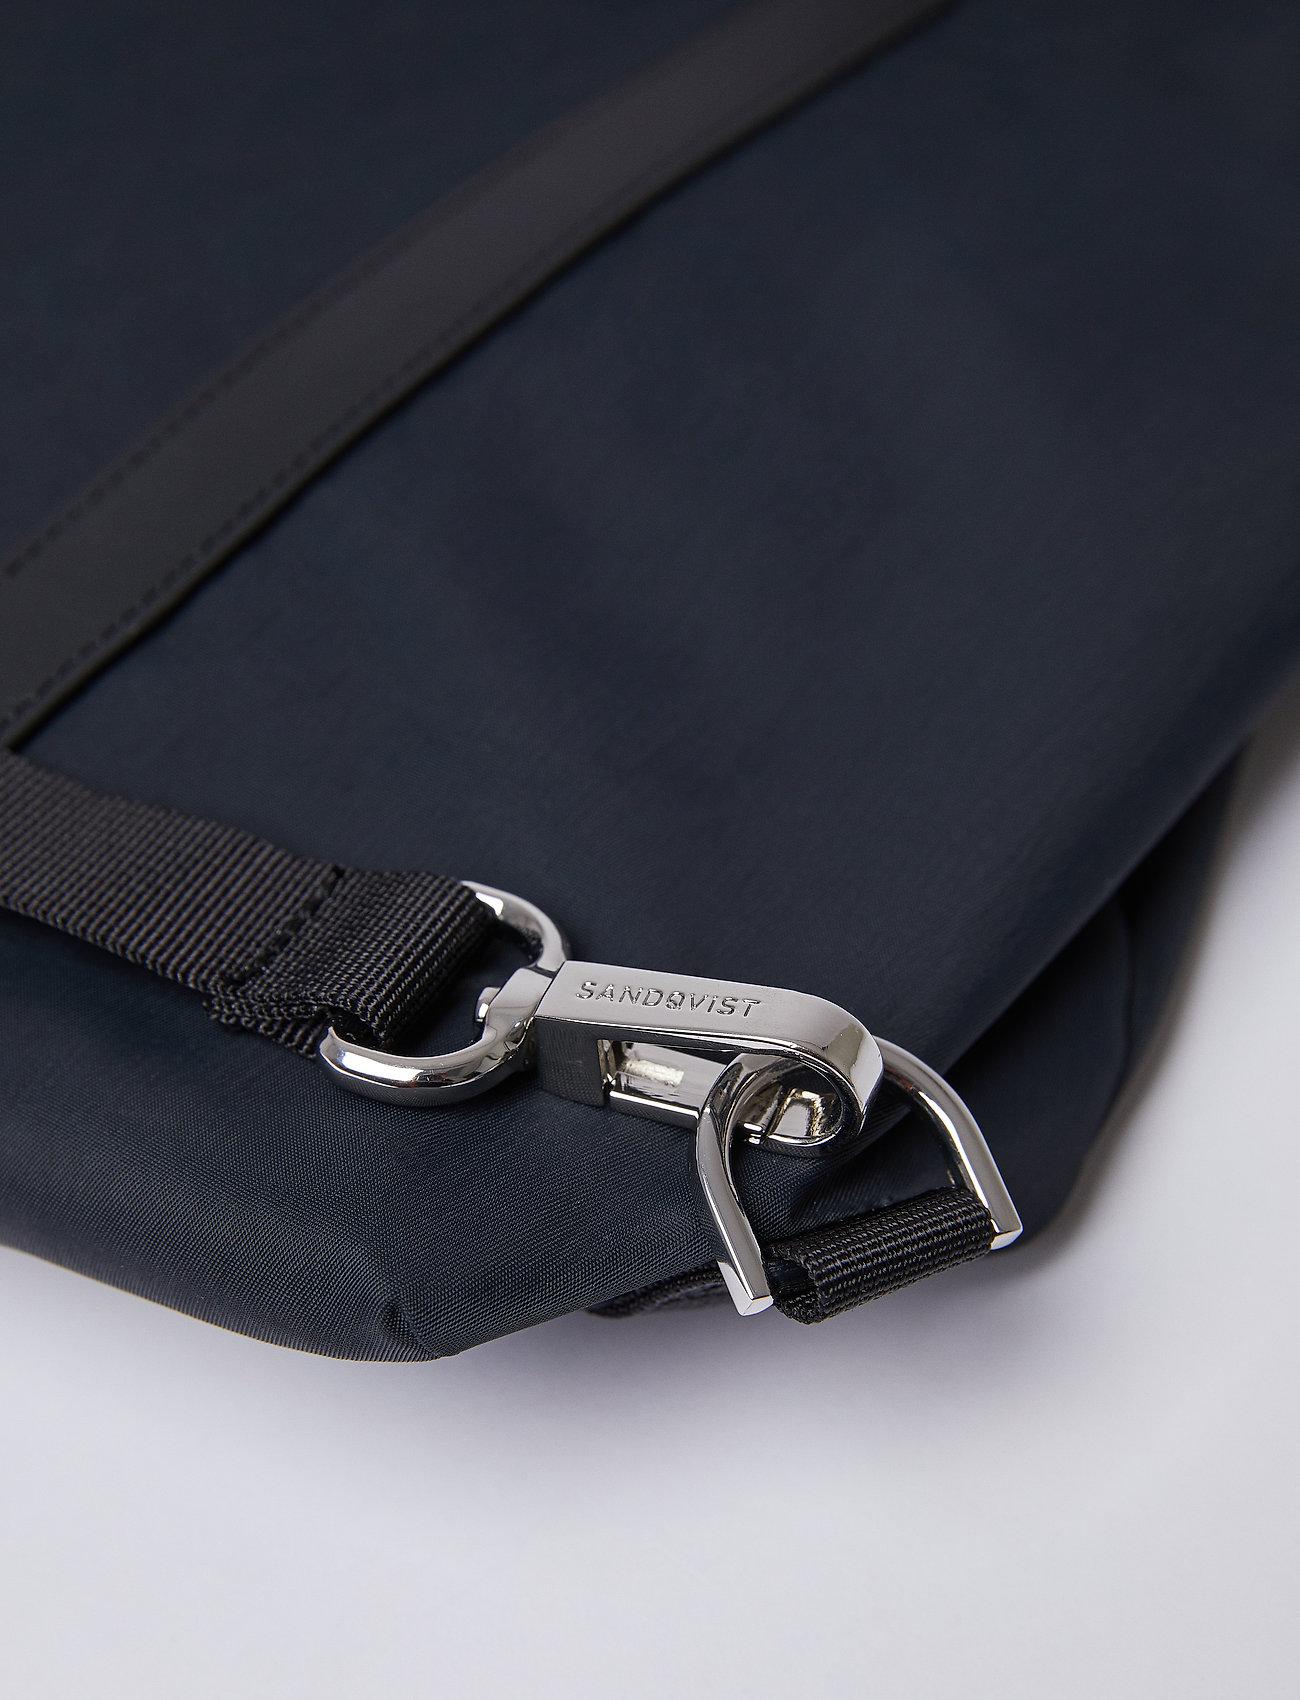 SANDQVIST - MARTA - nieuwe mode - black with black leather - 8